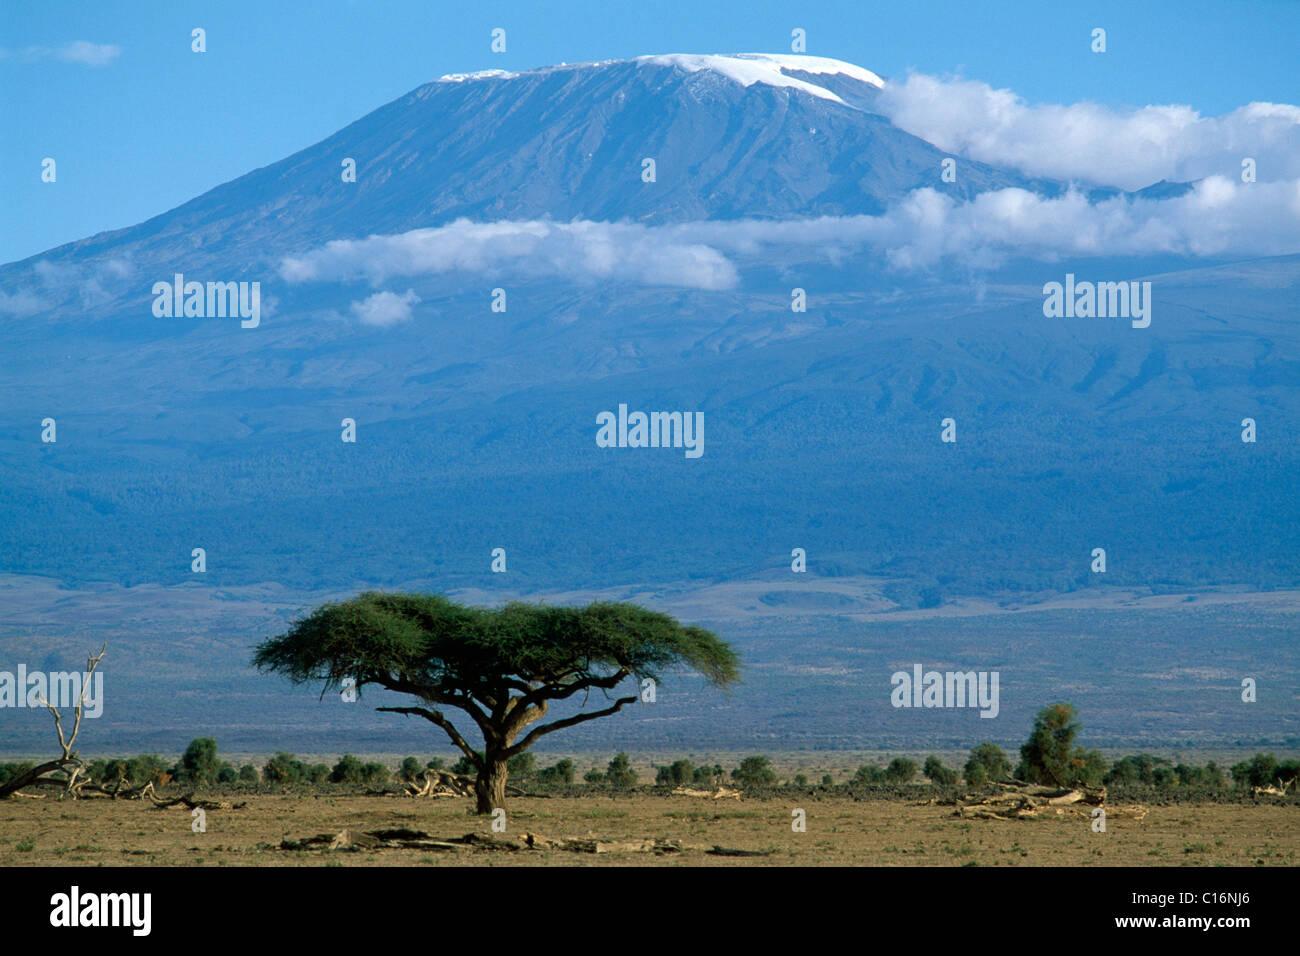 Mount Kilimanjaro, Amboseli National Park, Kenya, Africa - Stock Image